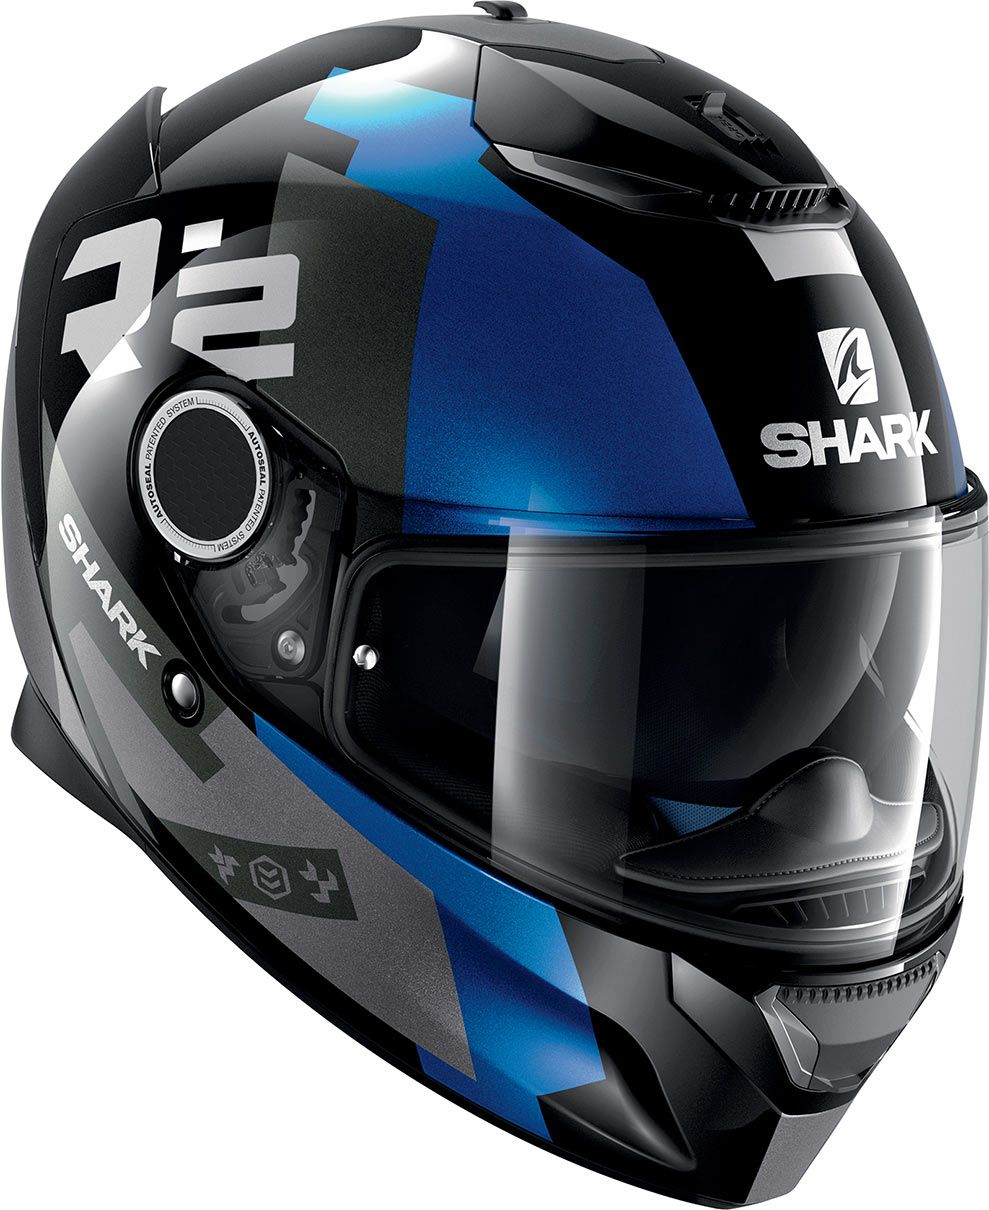 Shark Spartan Lintégral Touring Réinventé Helmets Motorcycle